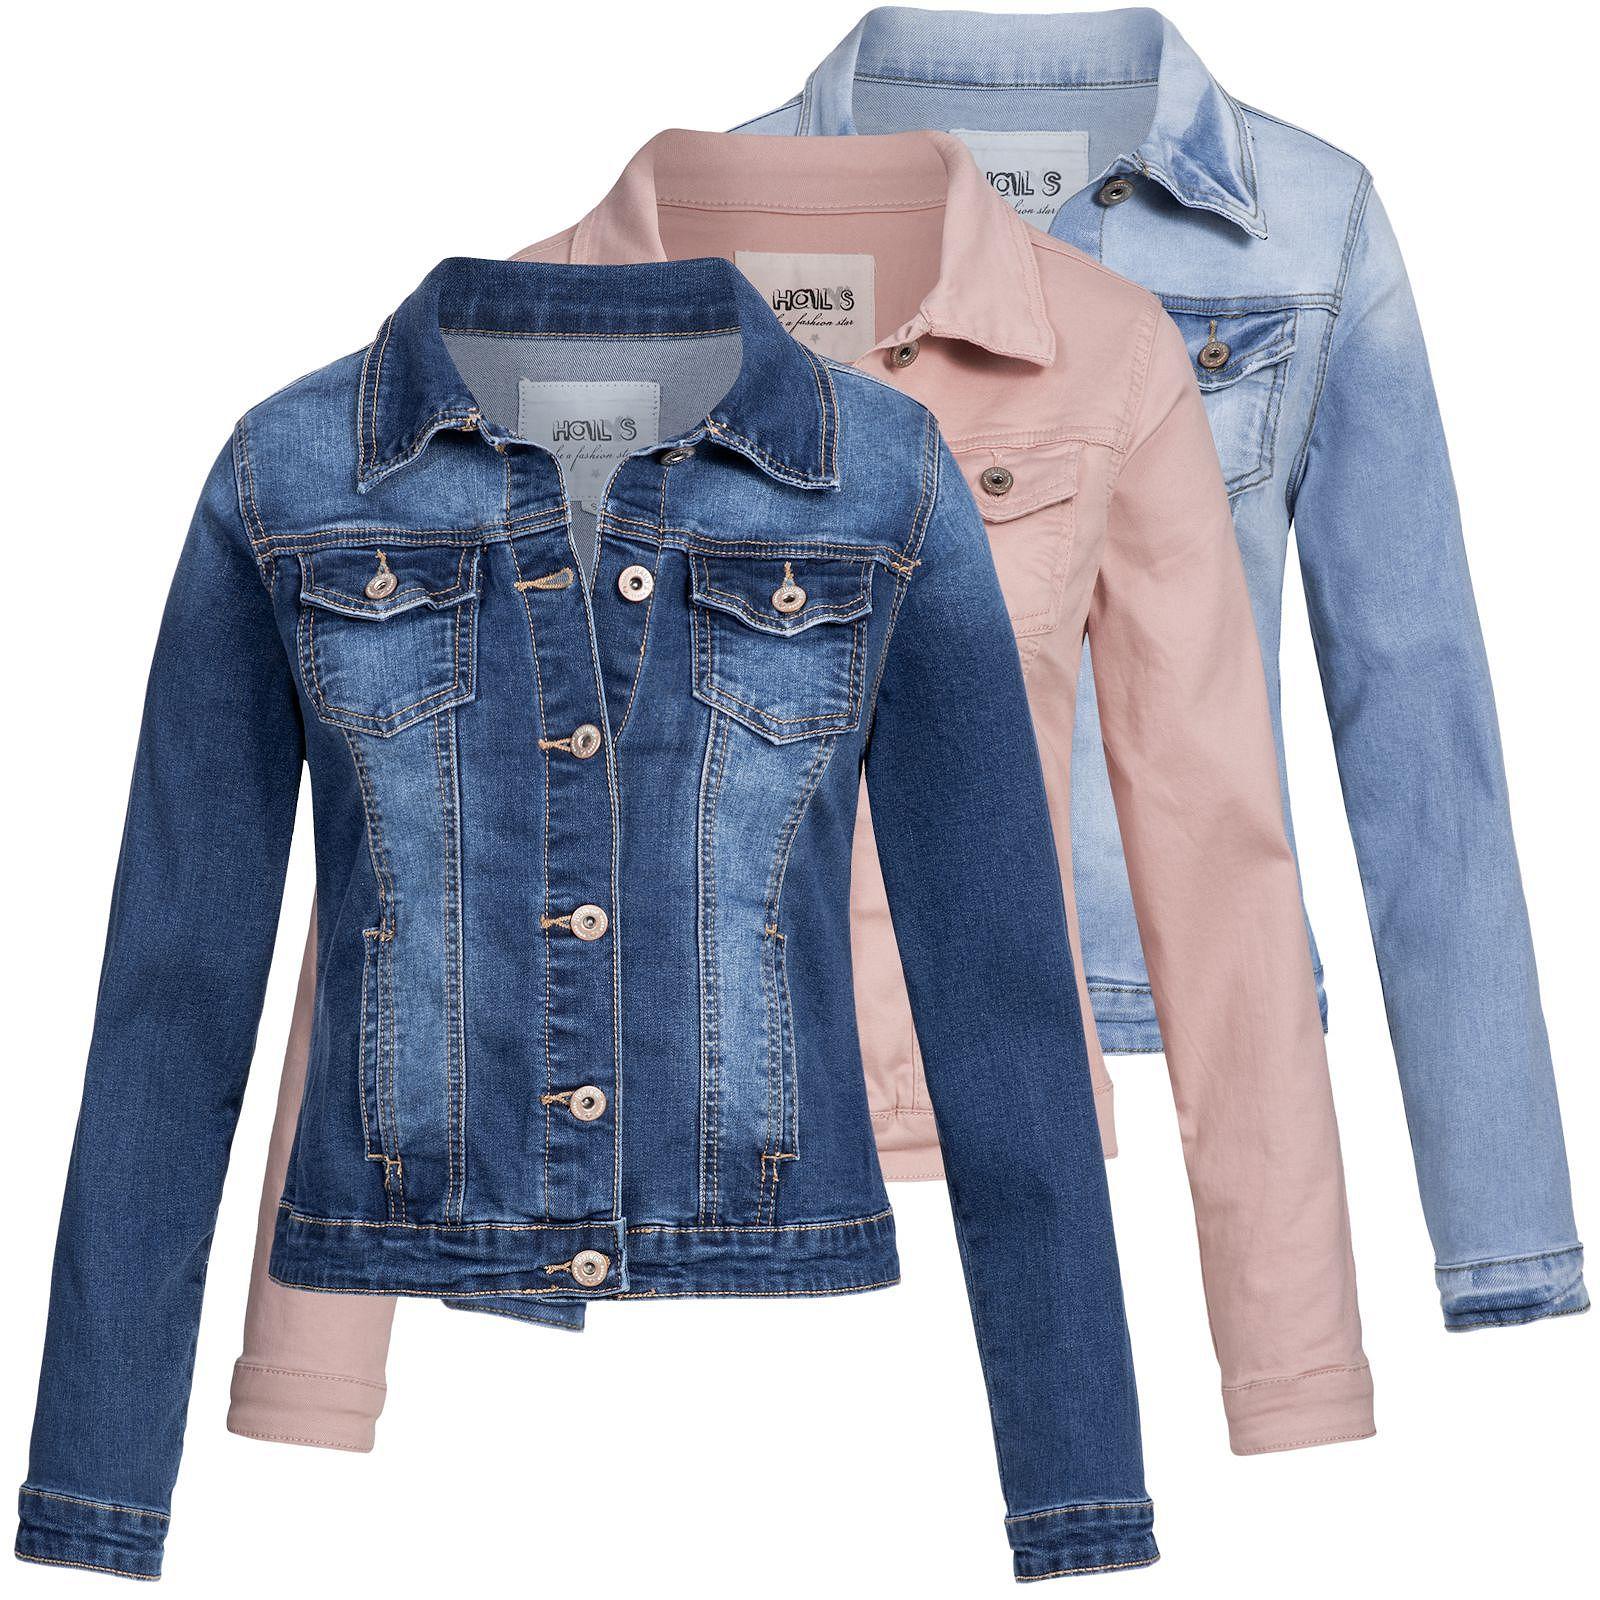 detailing b61bd a0c8d Details zu Damen Jeansjacke Jacke Denim Übergangsjacke Damenjacke Hailys  Enny